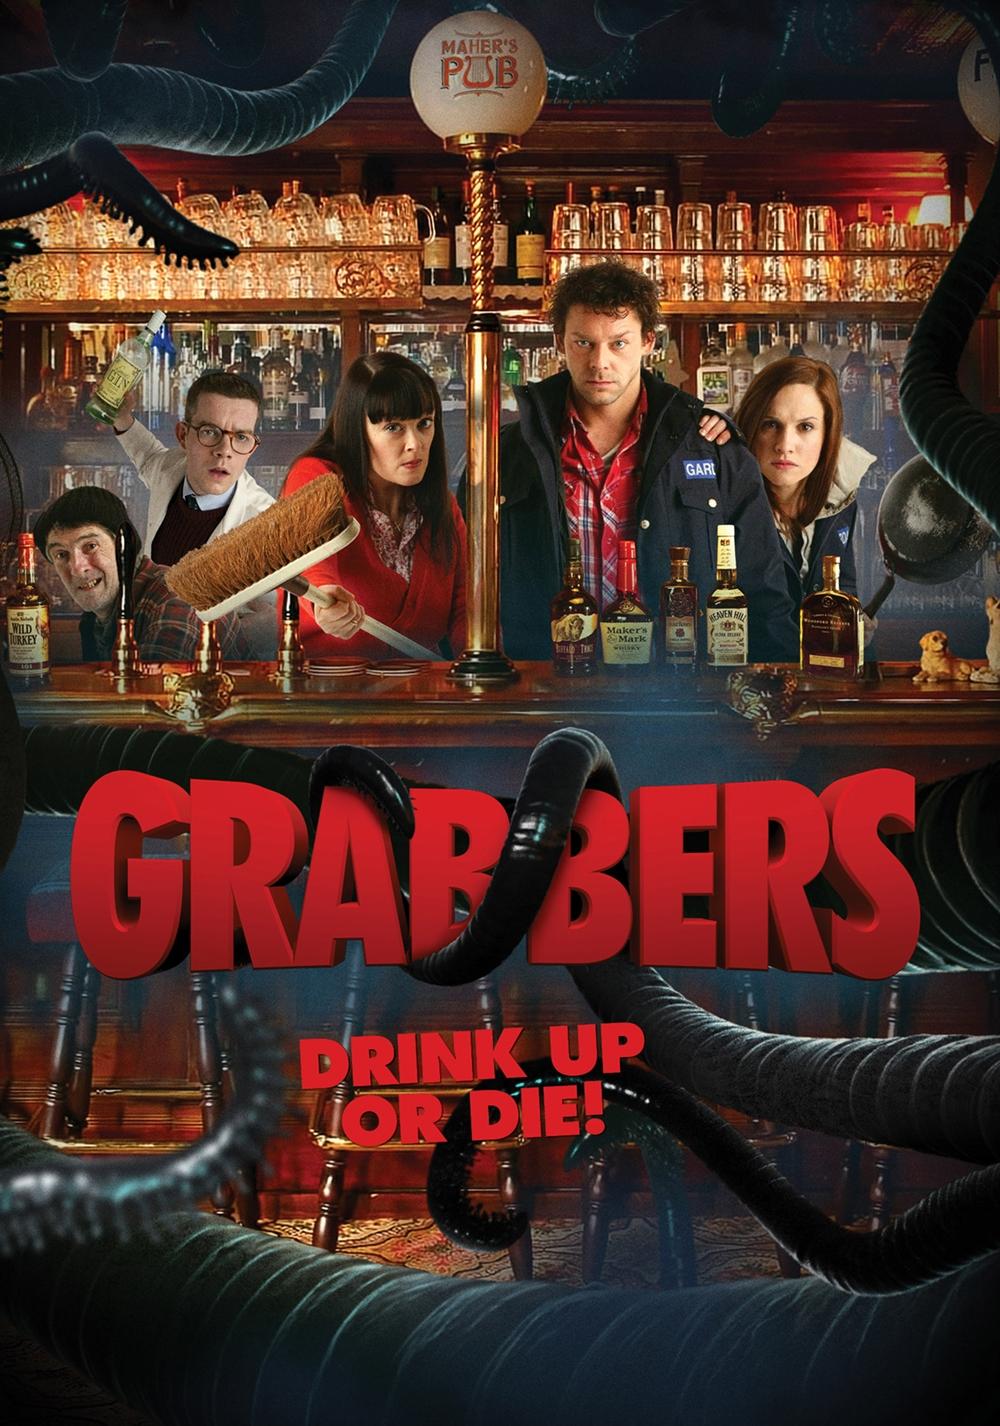 Grabbers Movie Poster Grabbers Movie Poster Image